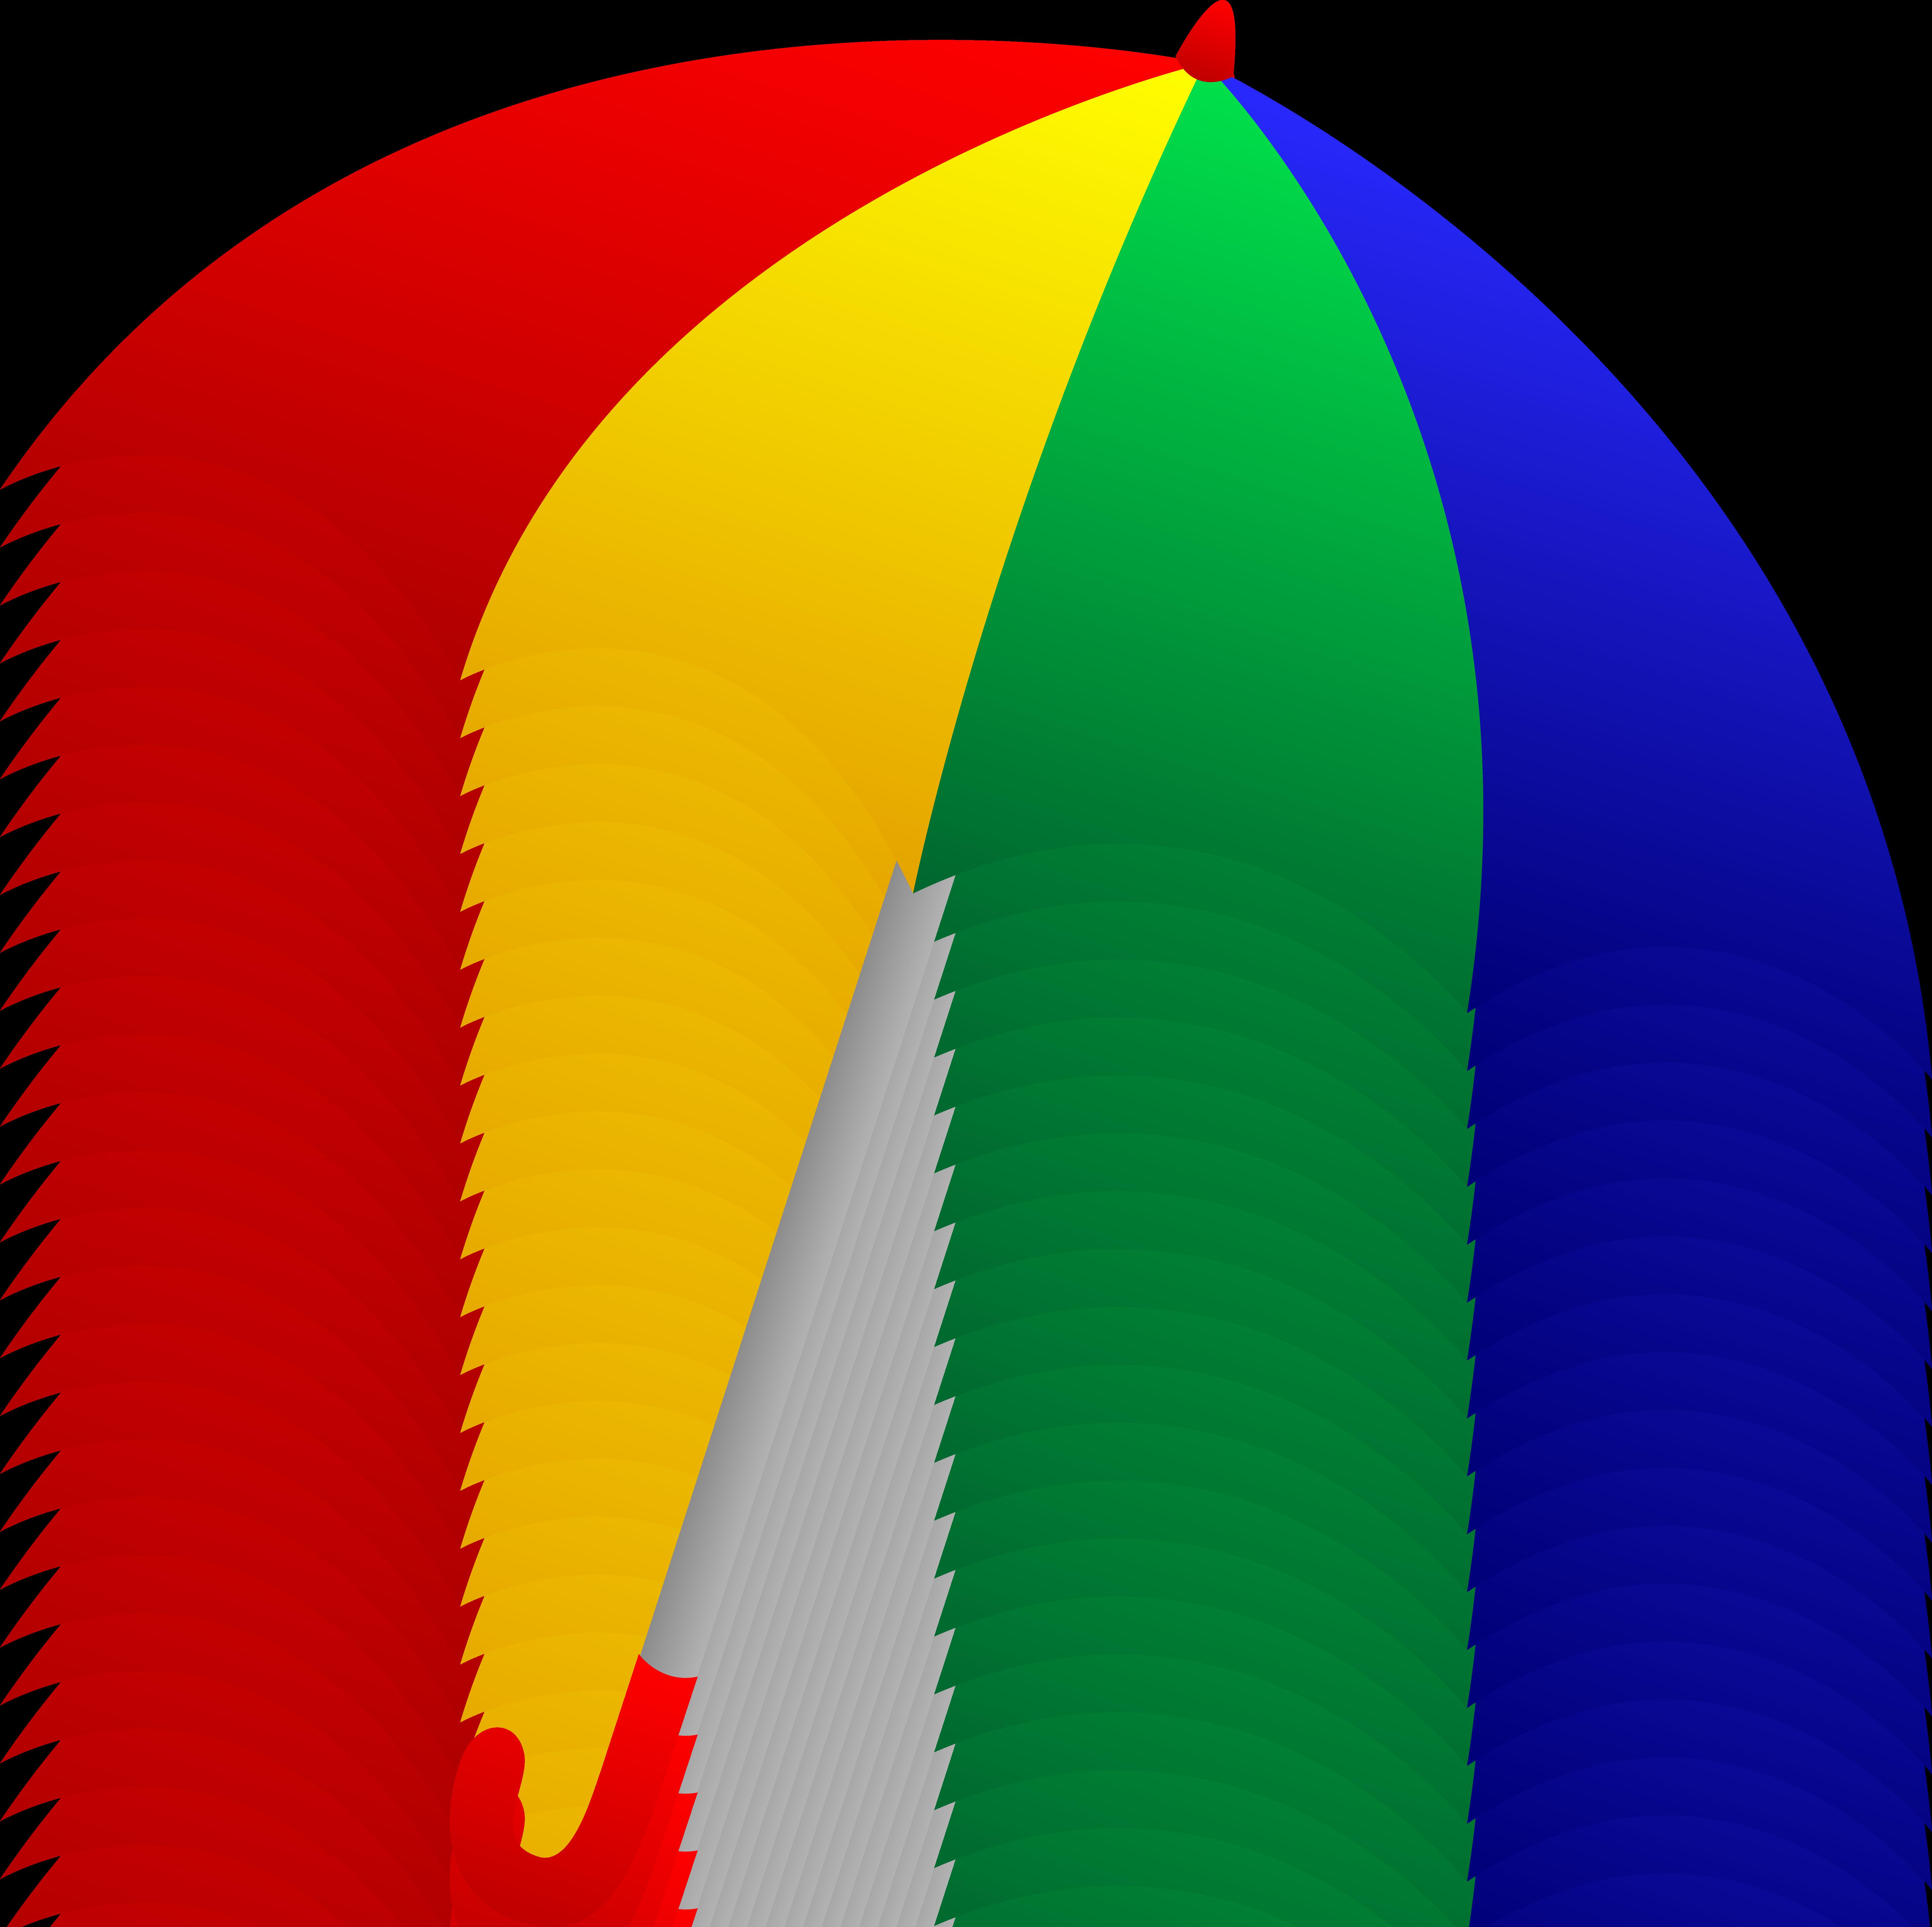 Beach umbrella and chair png - Cartoon Umbrellas Art Png 6607x6590 Cartoon Beach Umbrellas Clip Art Png